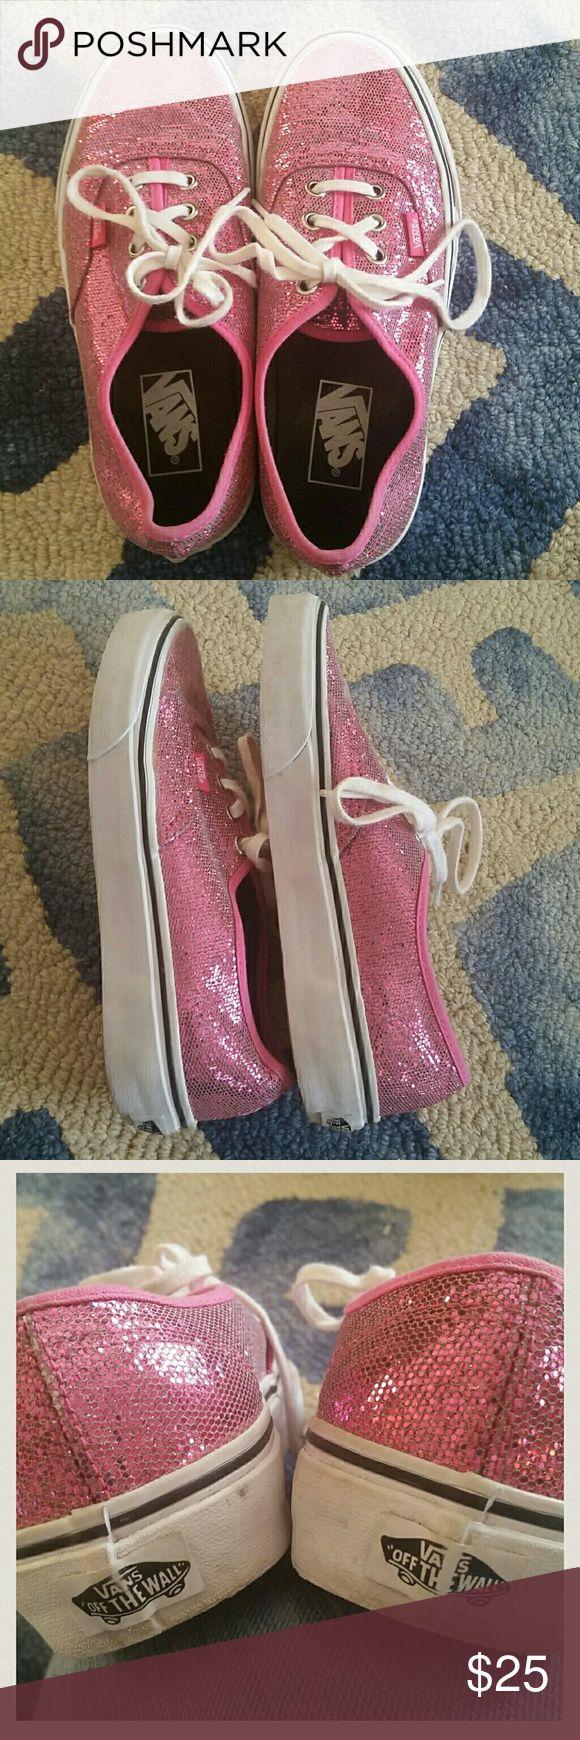 Pink Glitter Vans ADORABLE! Great condition Vans Shoes Sneakers